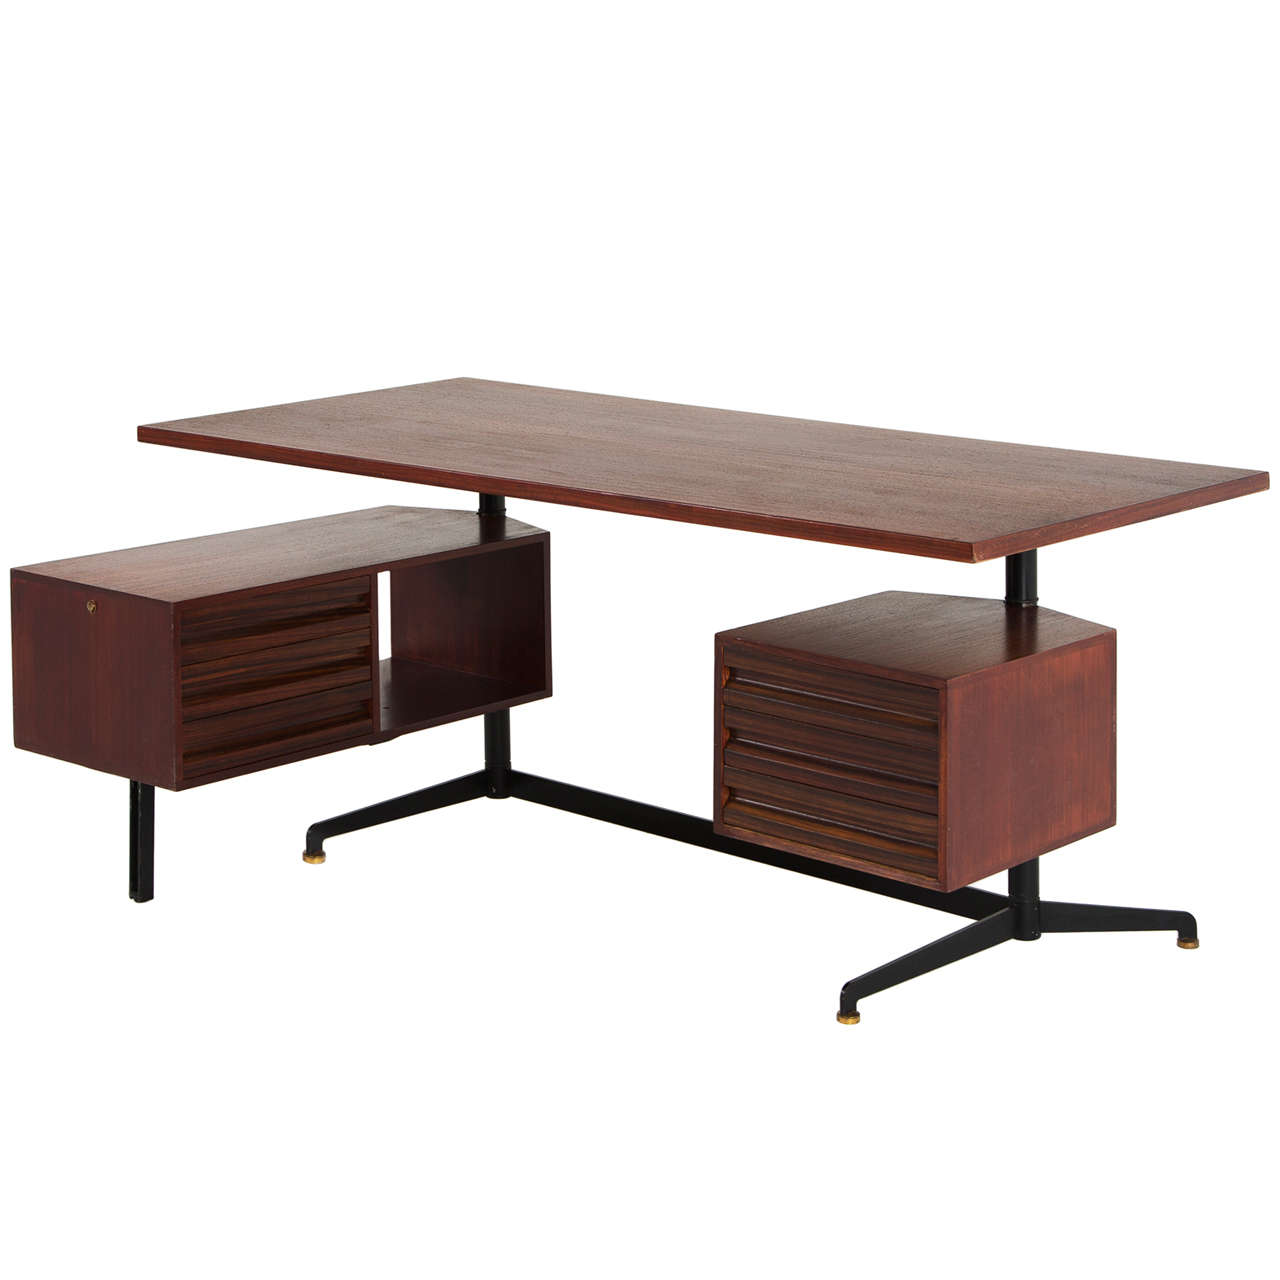 Early 1950s Executive Desk by Osvaldo Borsani in Rosewood